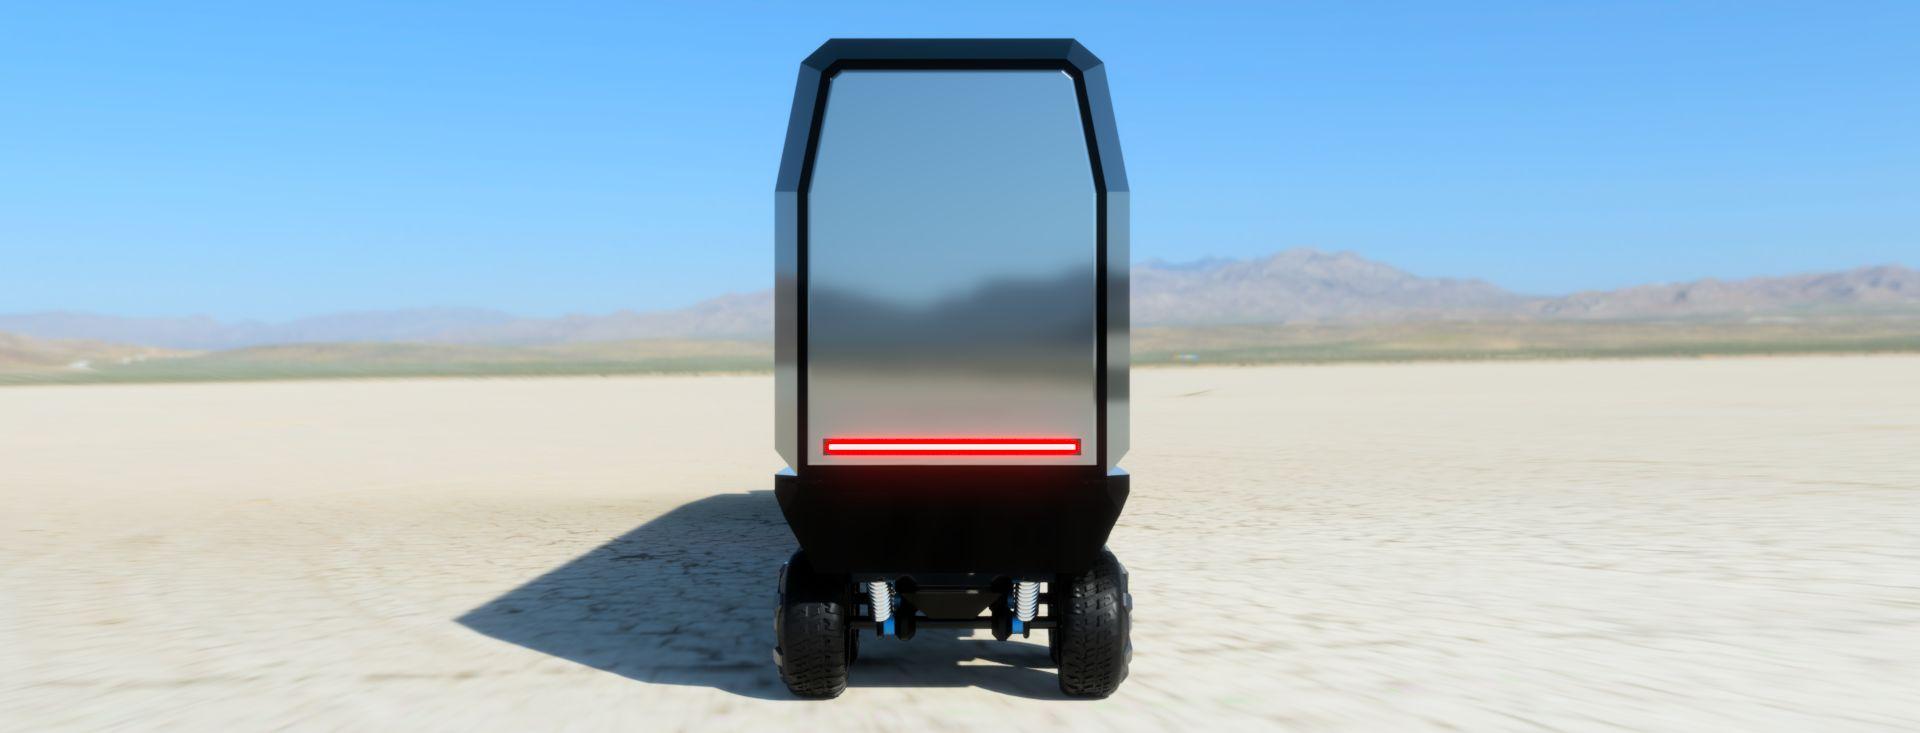 Tesla-cybervan-2020-apr-14-03-43-20am-000-customizedview22931839825-png-3500-3500